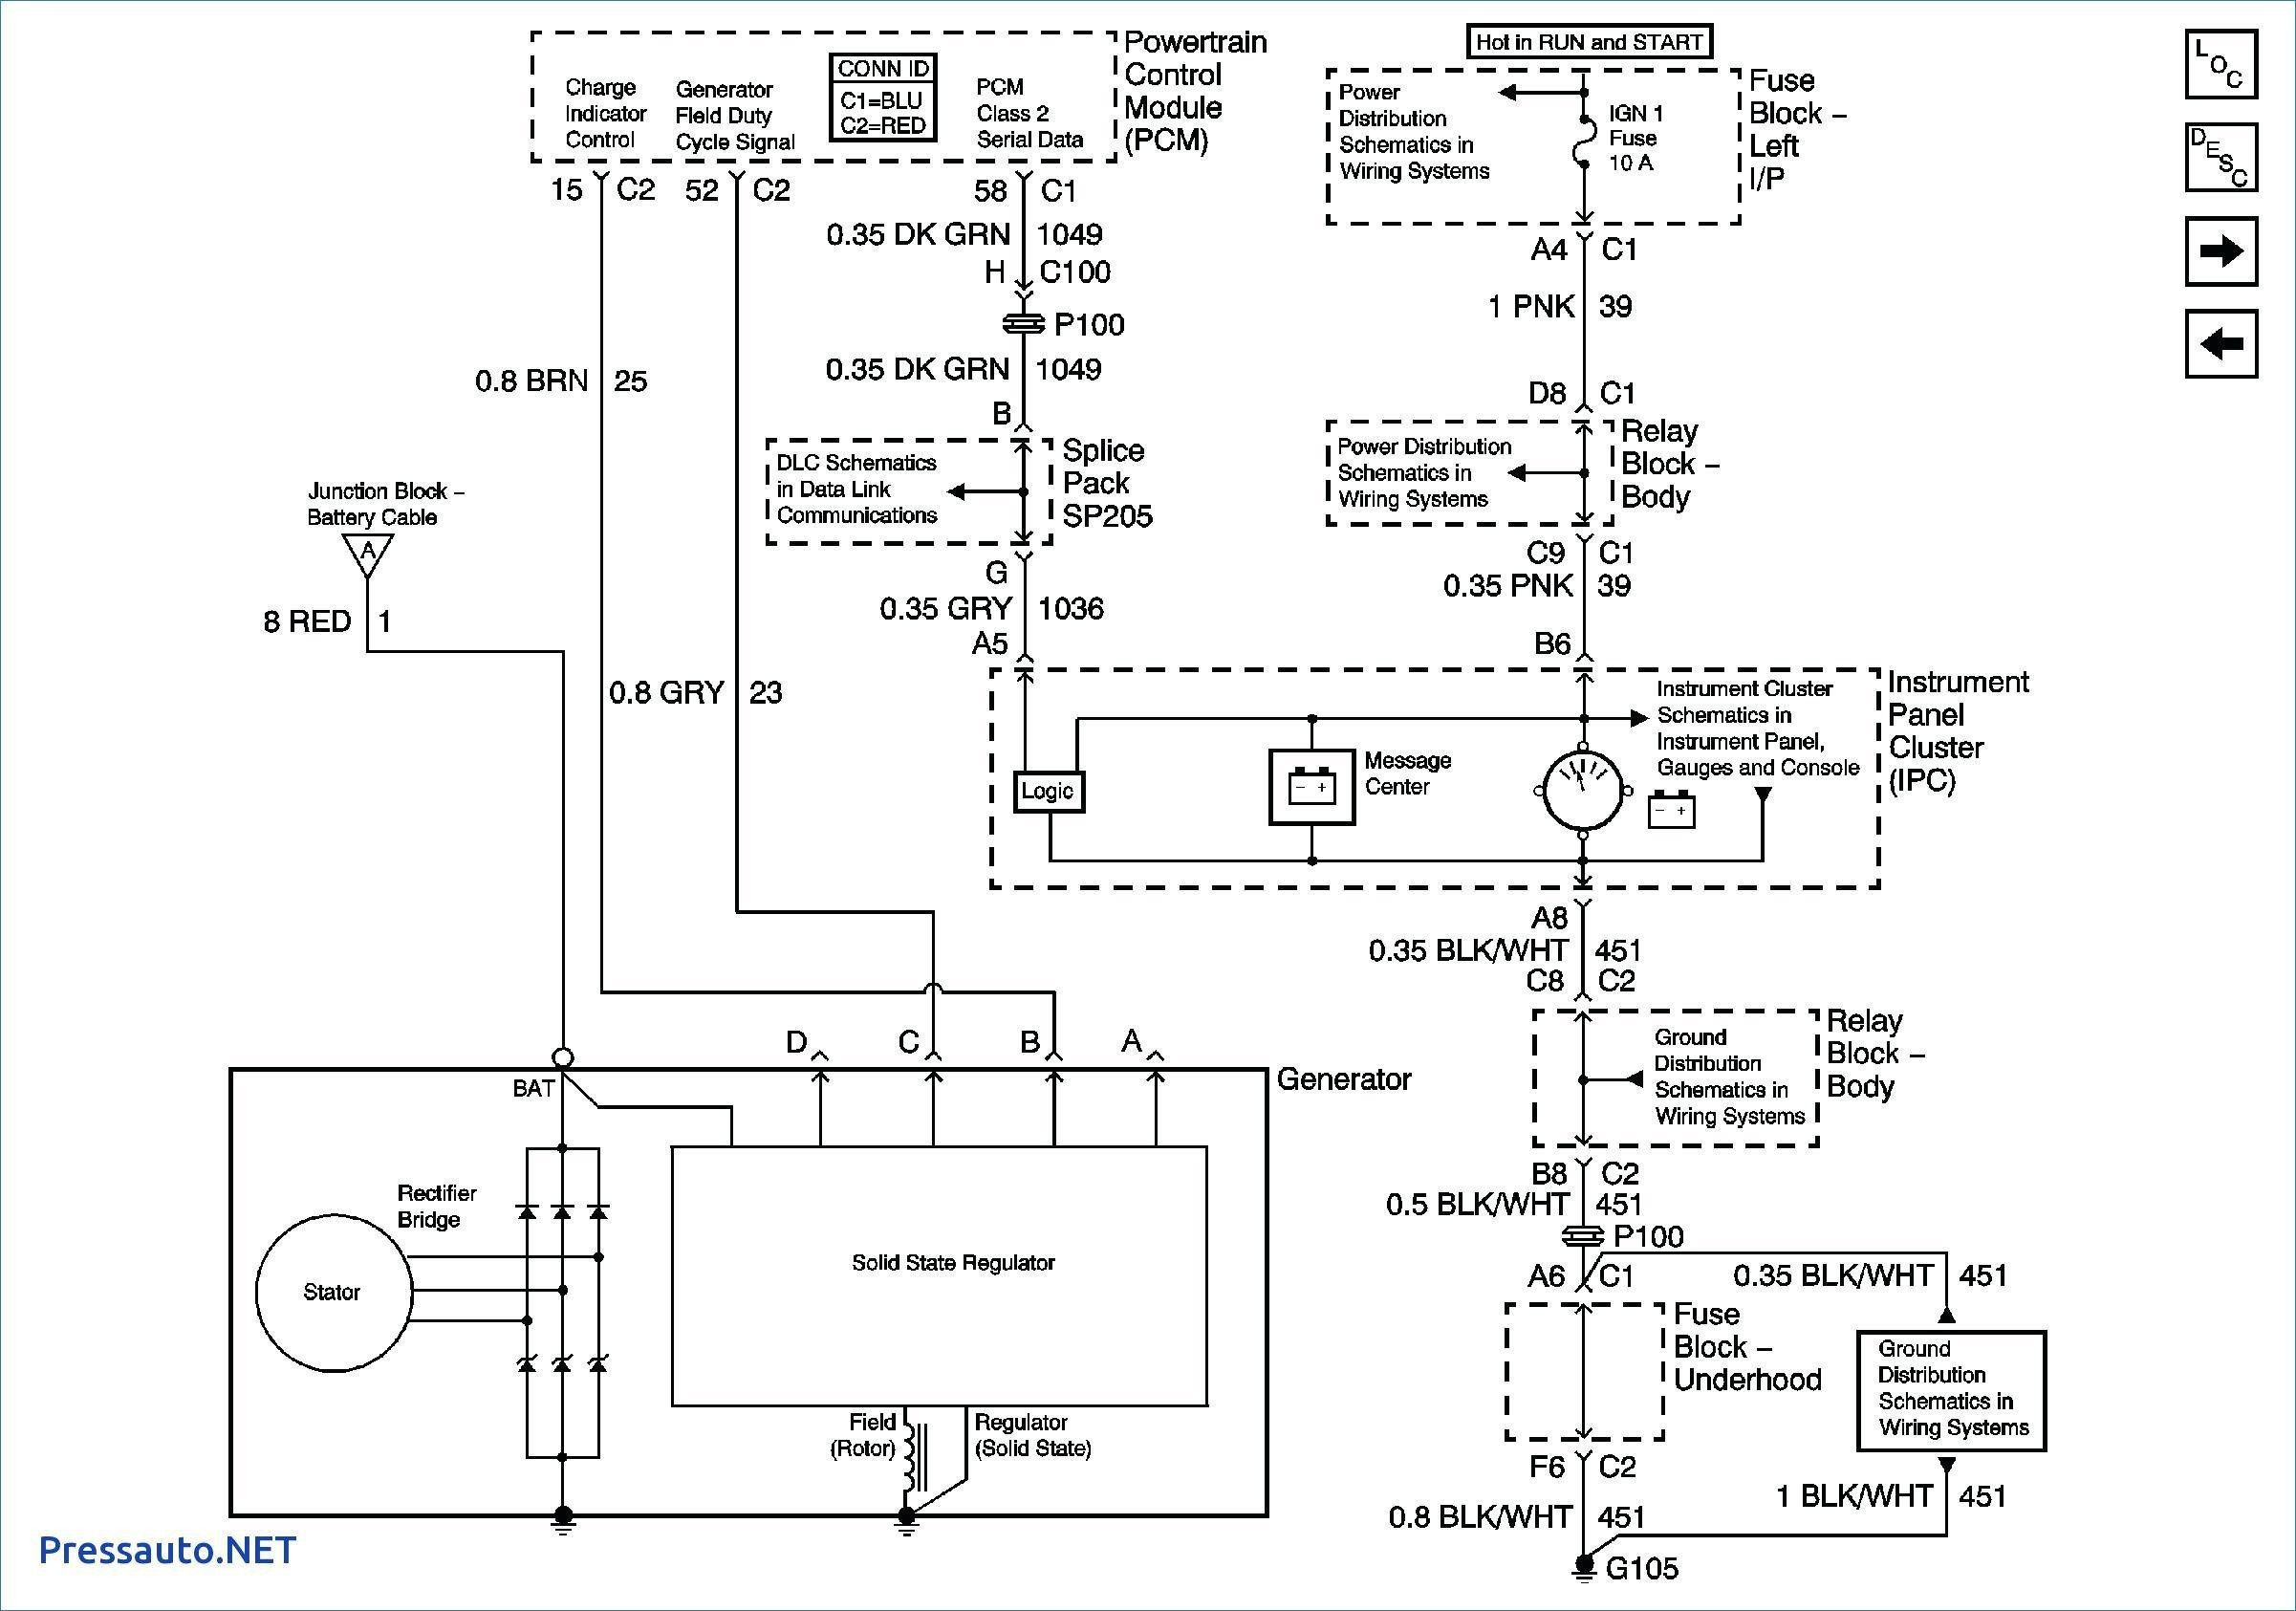 Car Powertrain Diagram Auto Wiring Diagram Symbols Save Simple Vehicle Wiring Diagram Of Car Powertrain Diagram